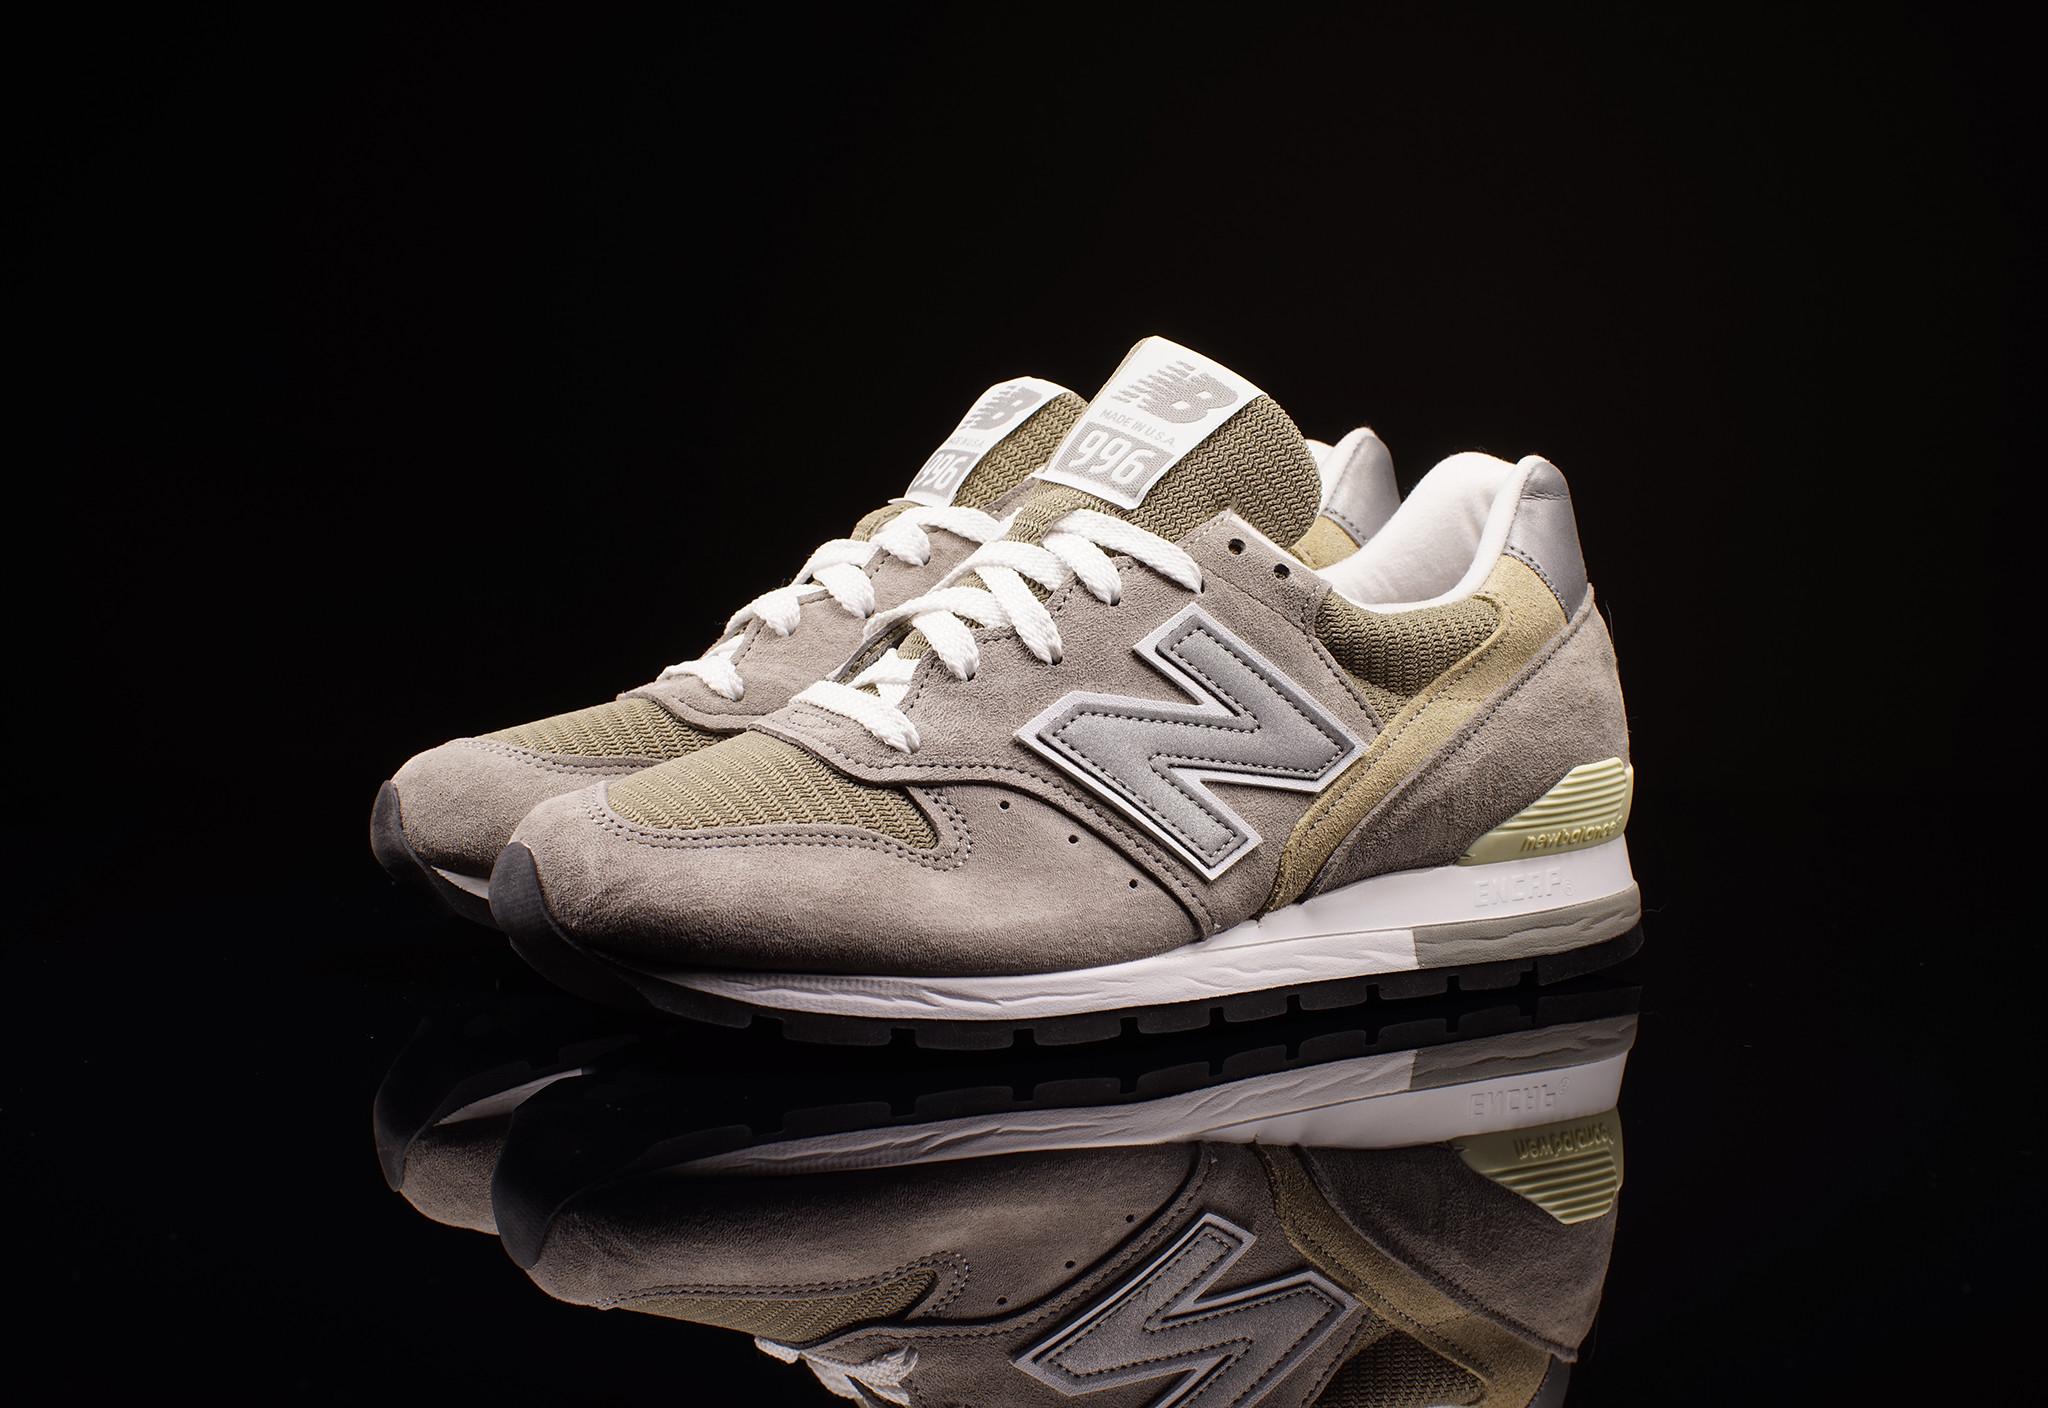 New Balance M996 Quot Pigskin Quot Og Sneakers Addict